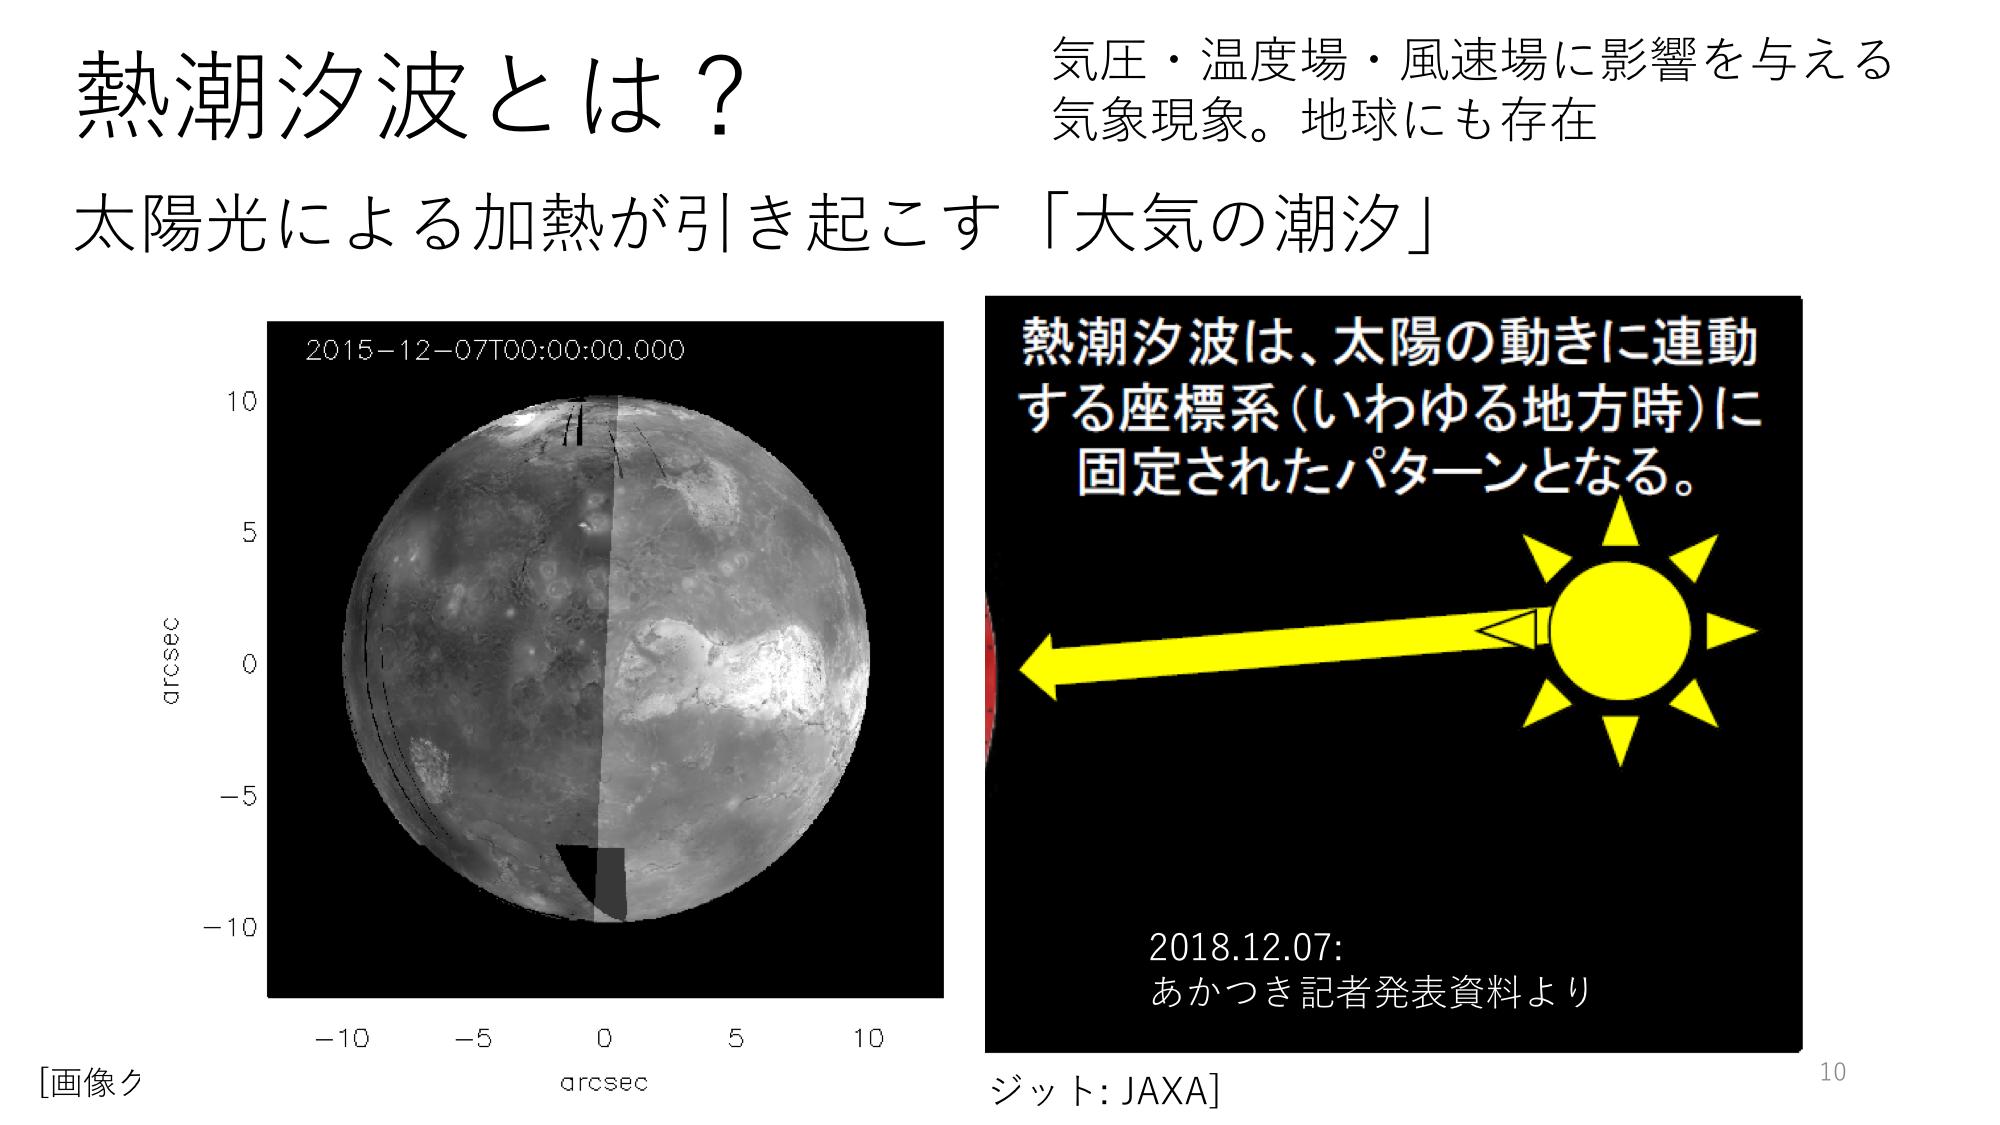 f:id:Imamura:20191119205431p:plain